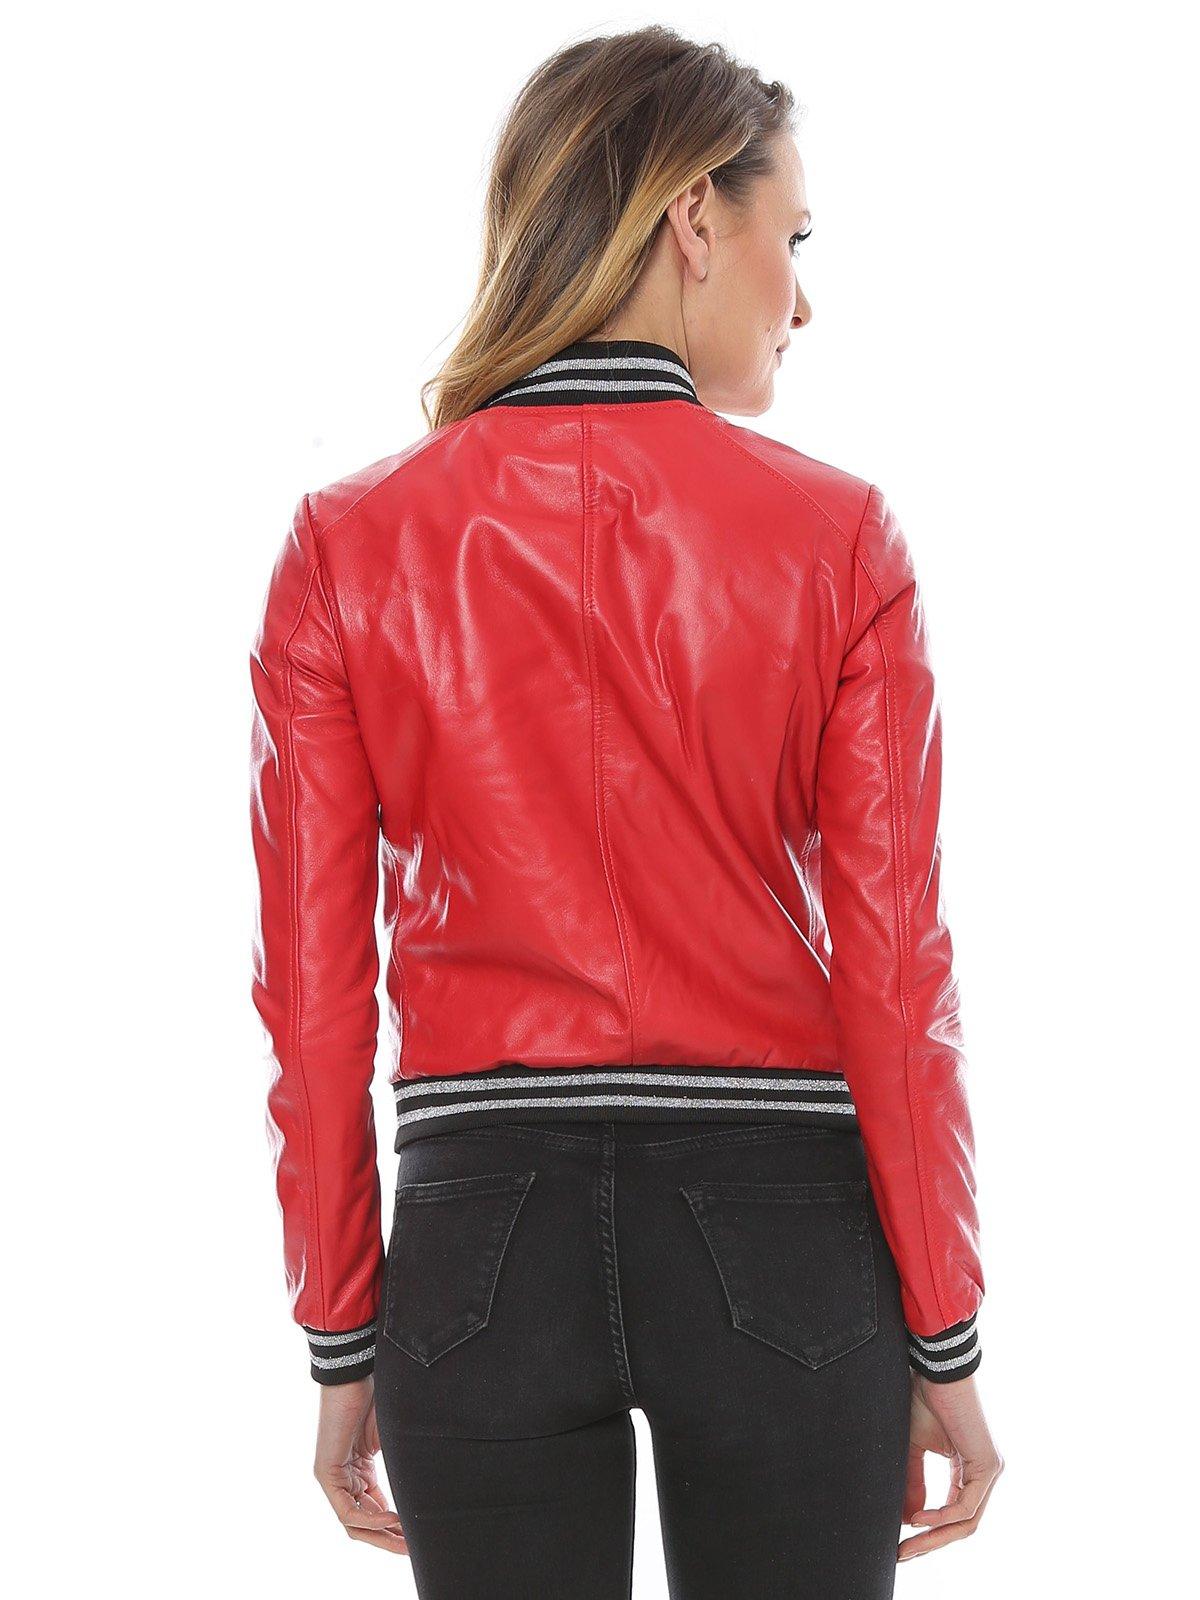 Куртка красная | 3010531 | фото 2